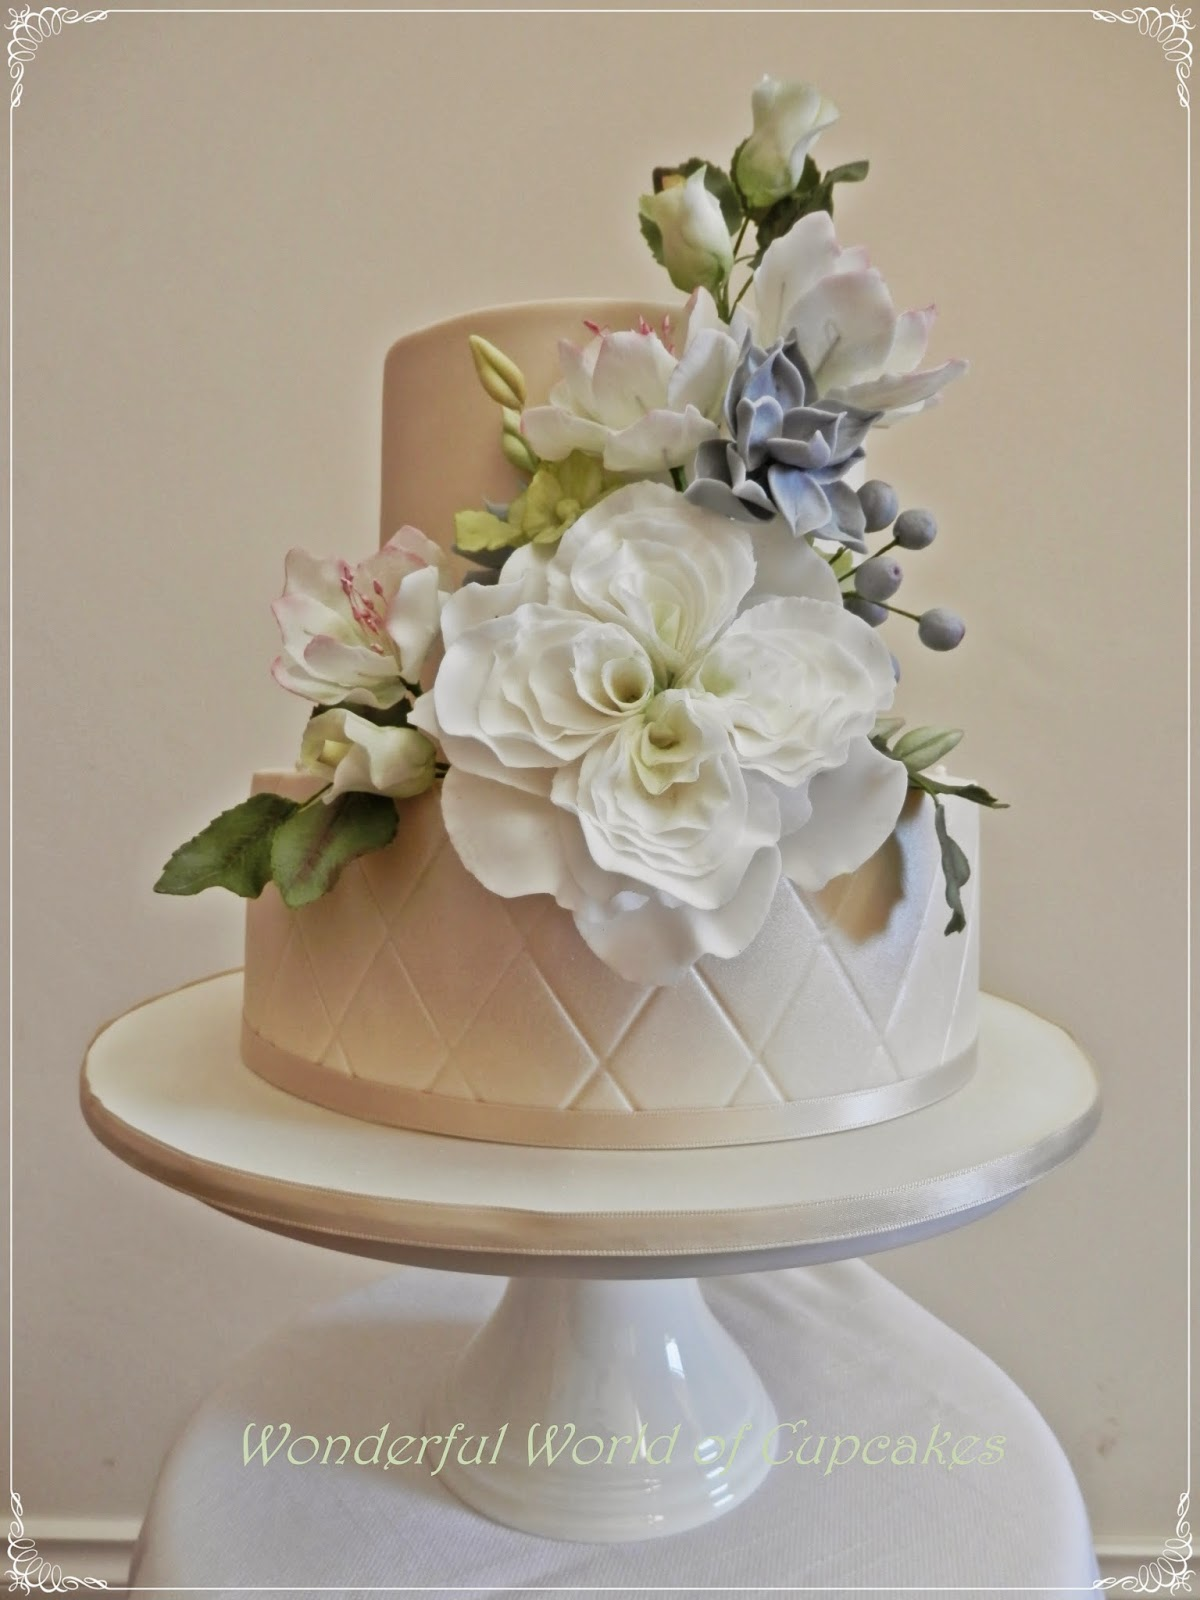 Wonderful World of Cupcakes Floral Wedding Cake